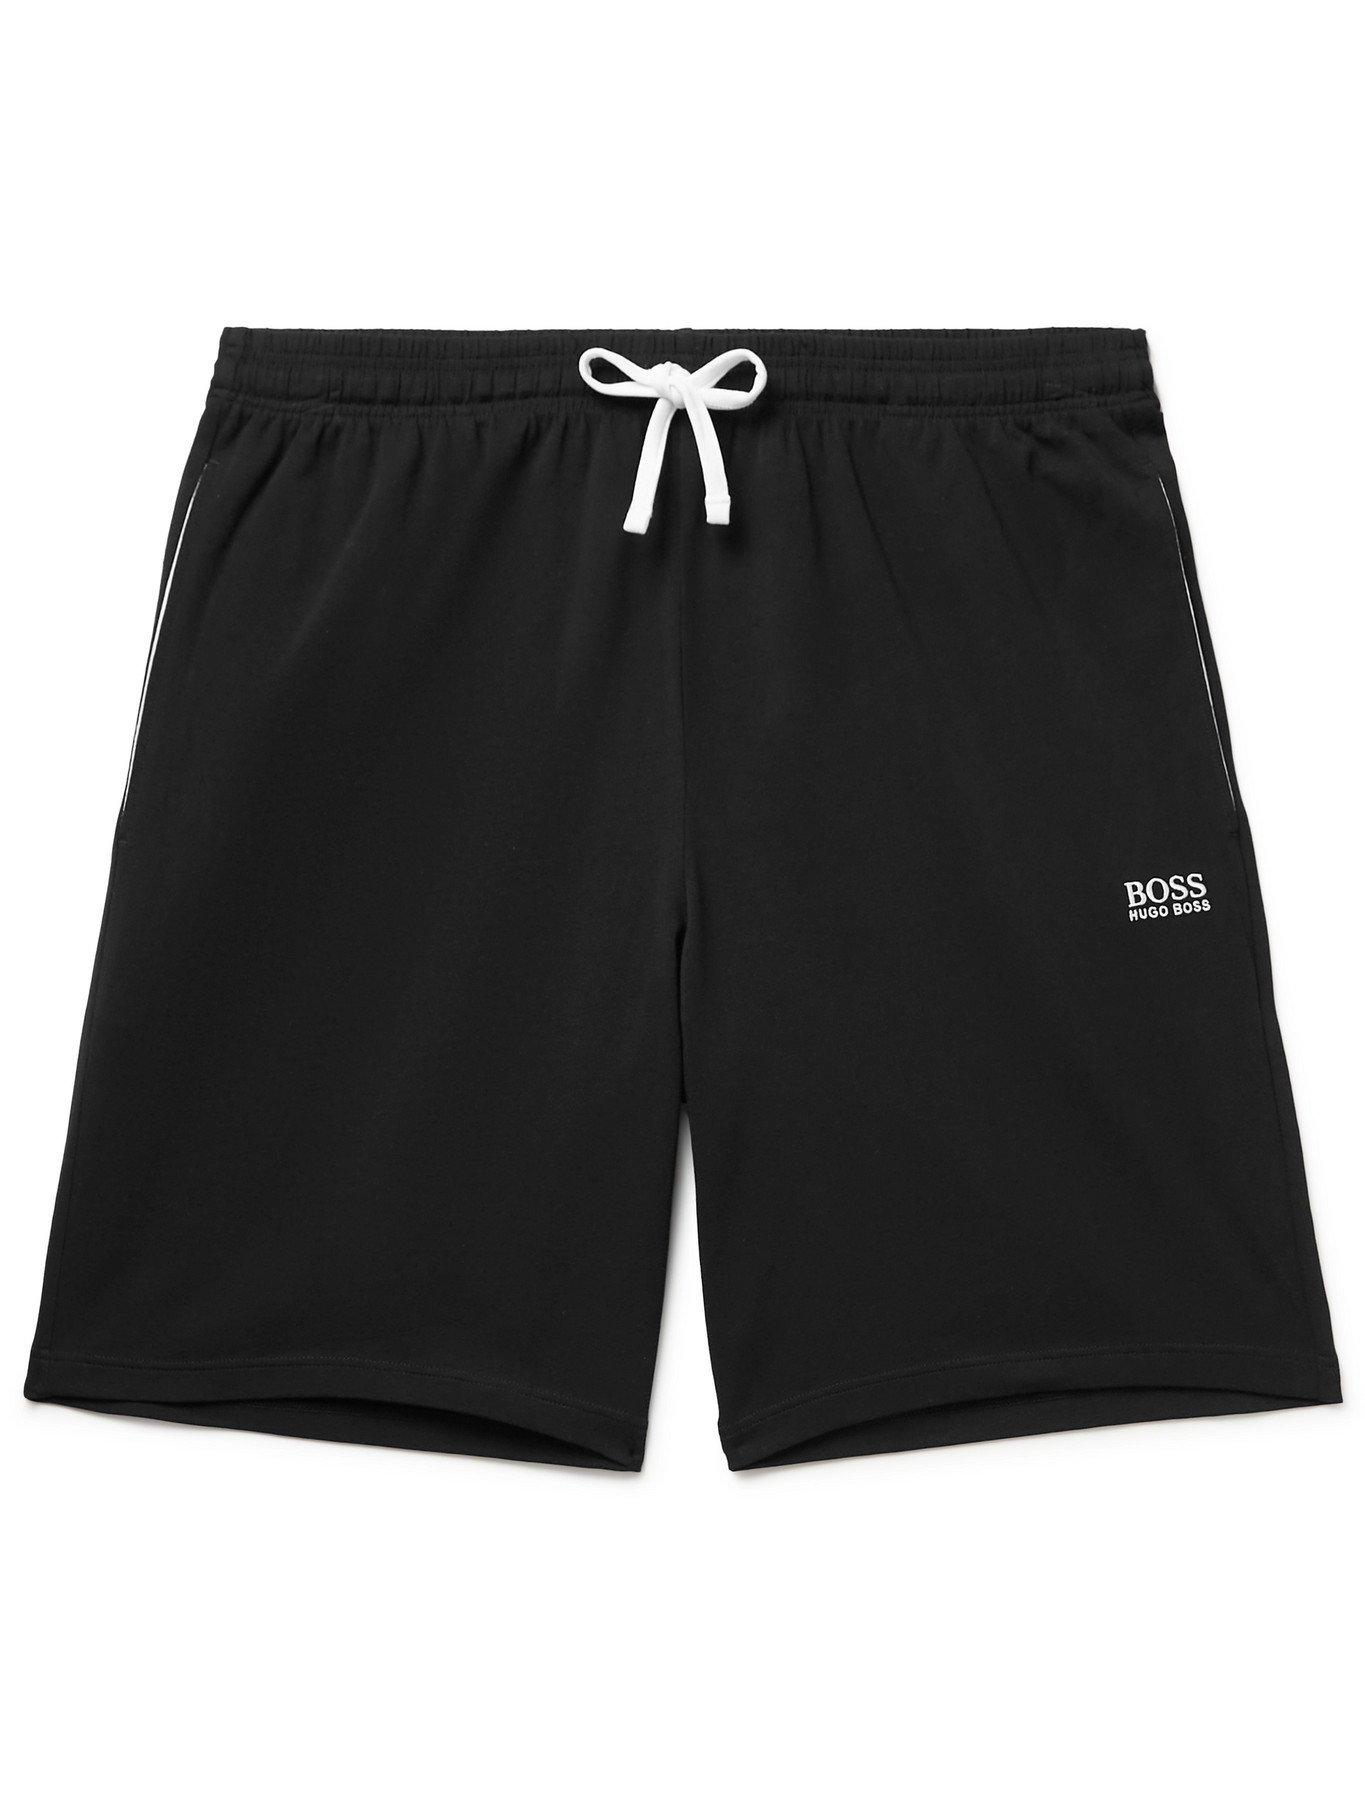 HUGO BOSS - Logo-Print Stretch-Cotton Jersey Pyjama Shorts - Black - S